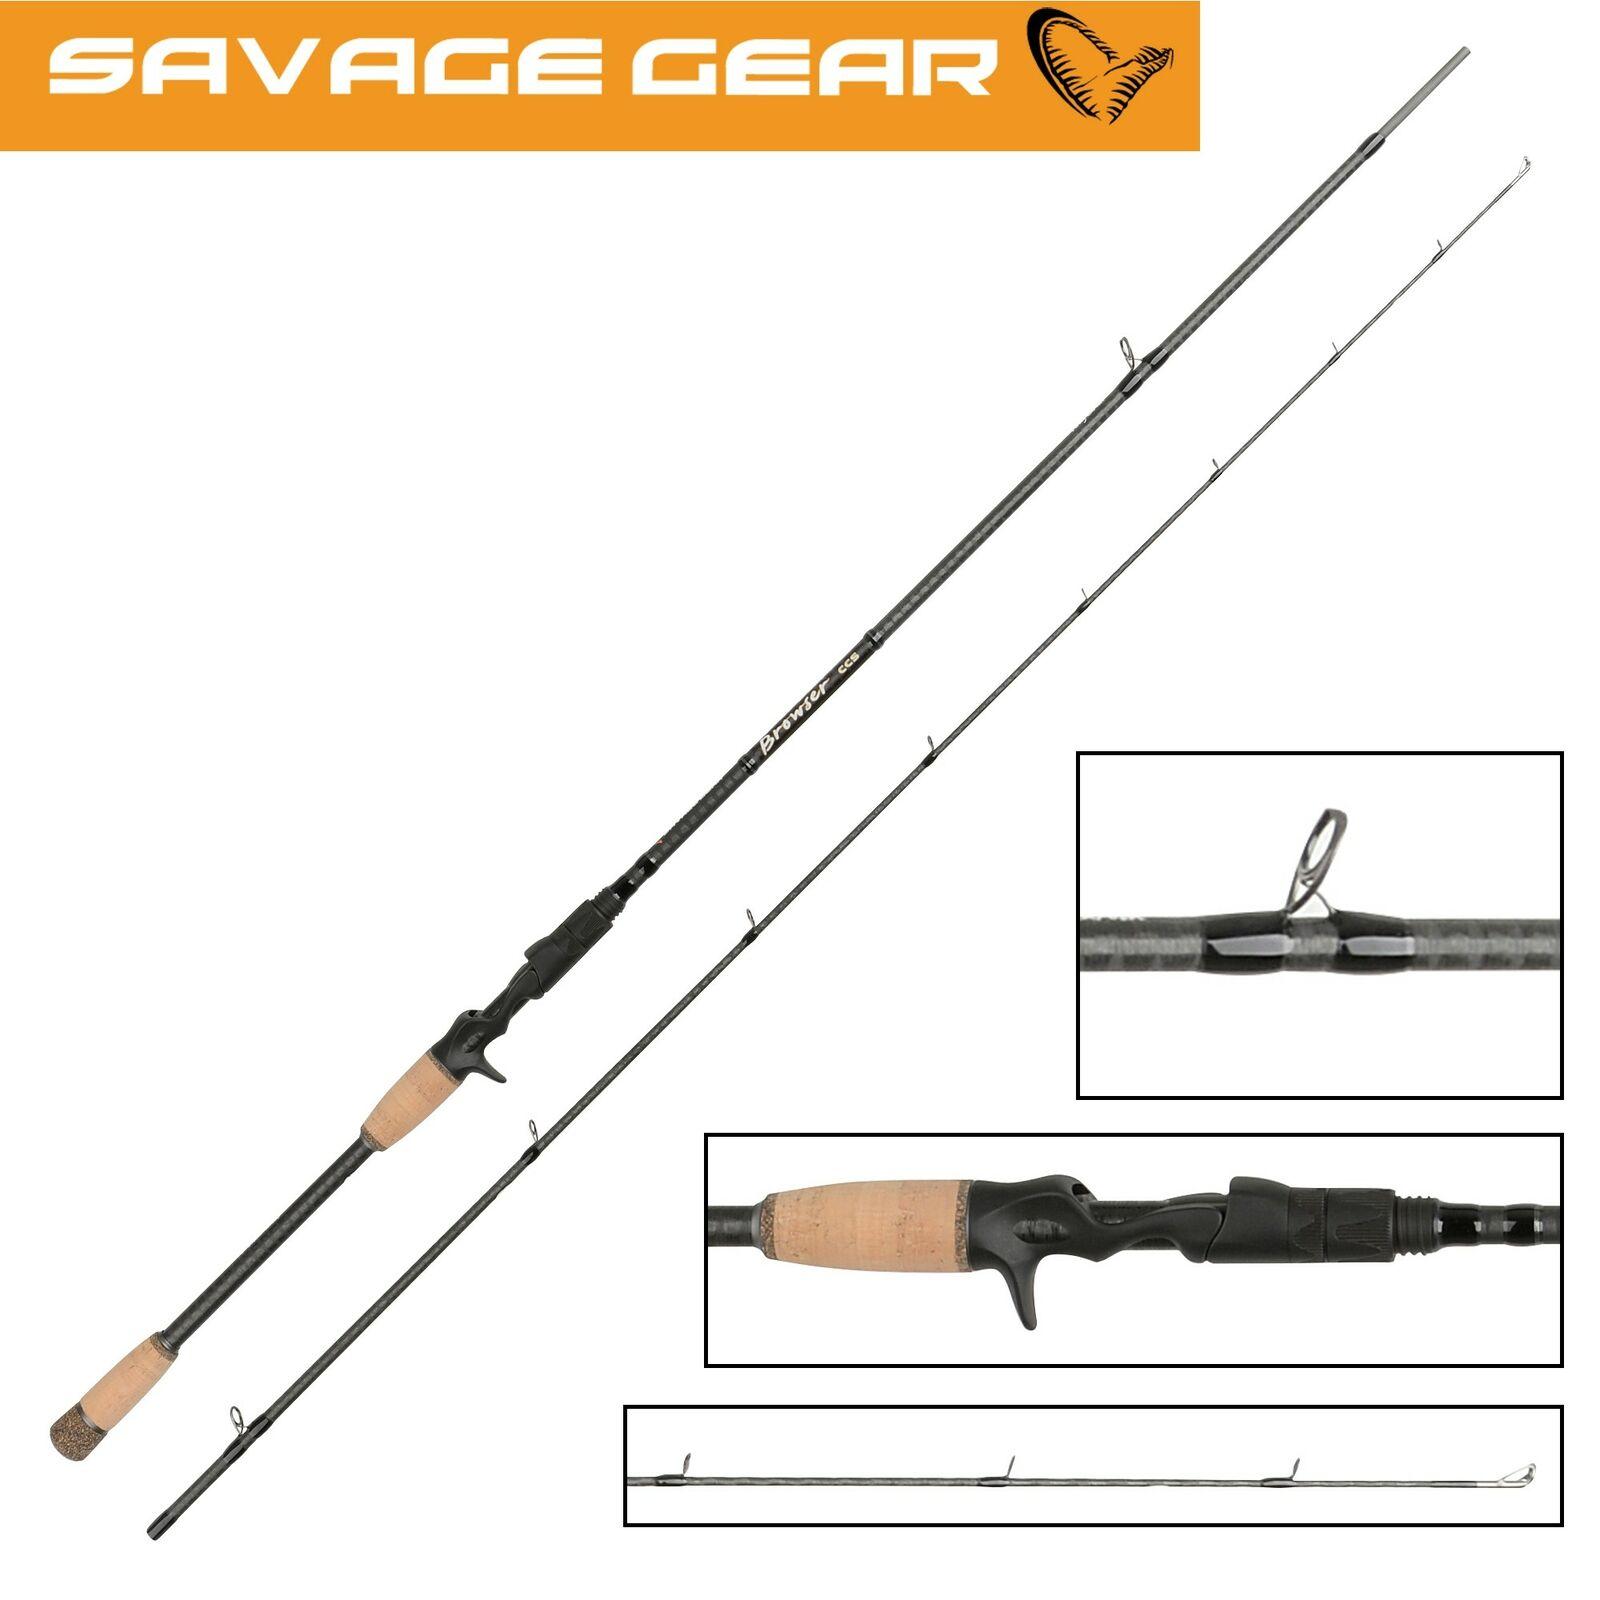 Savage Gear Browser CCS Cast 218cm 20-60g - Spinnrute, Spinnangel, Castingrute